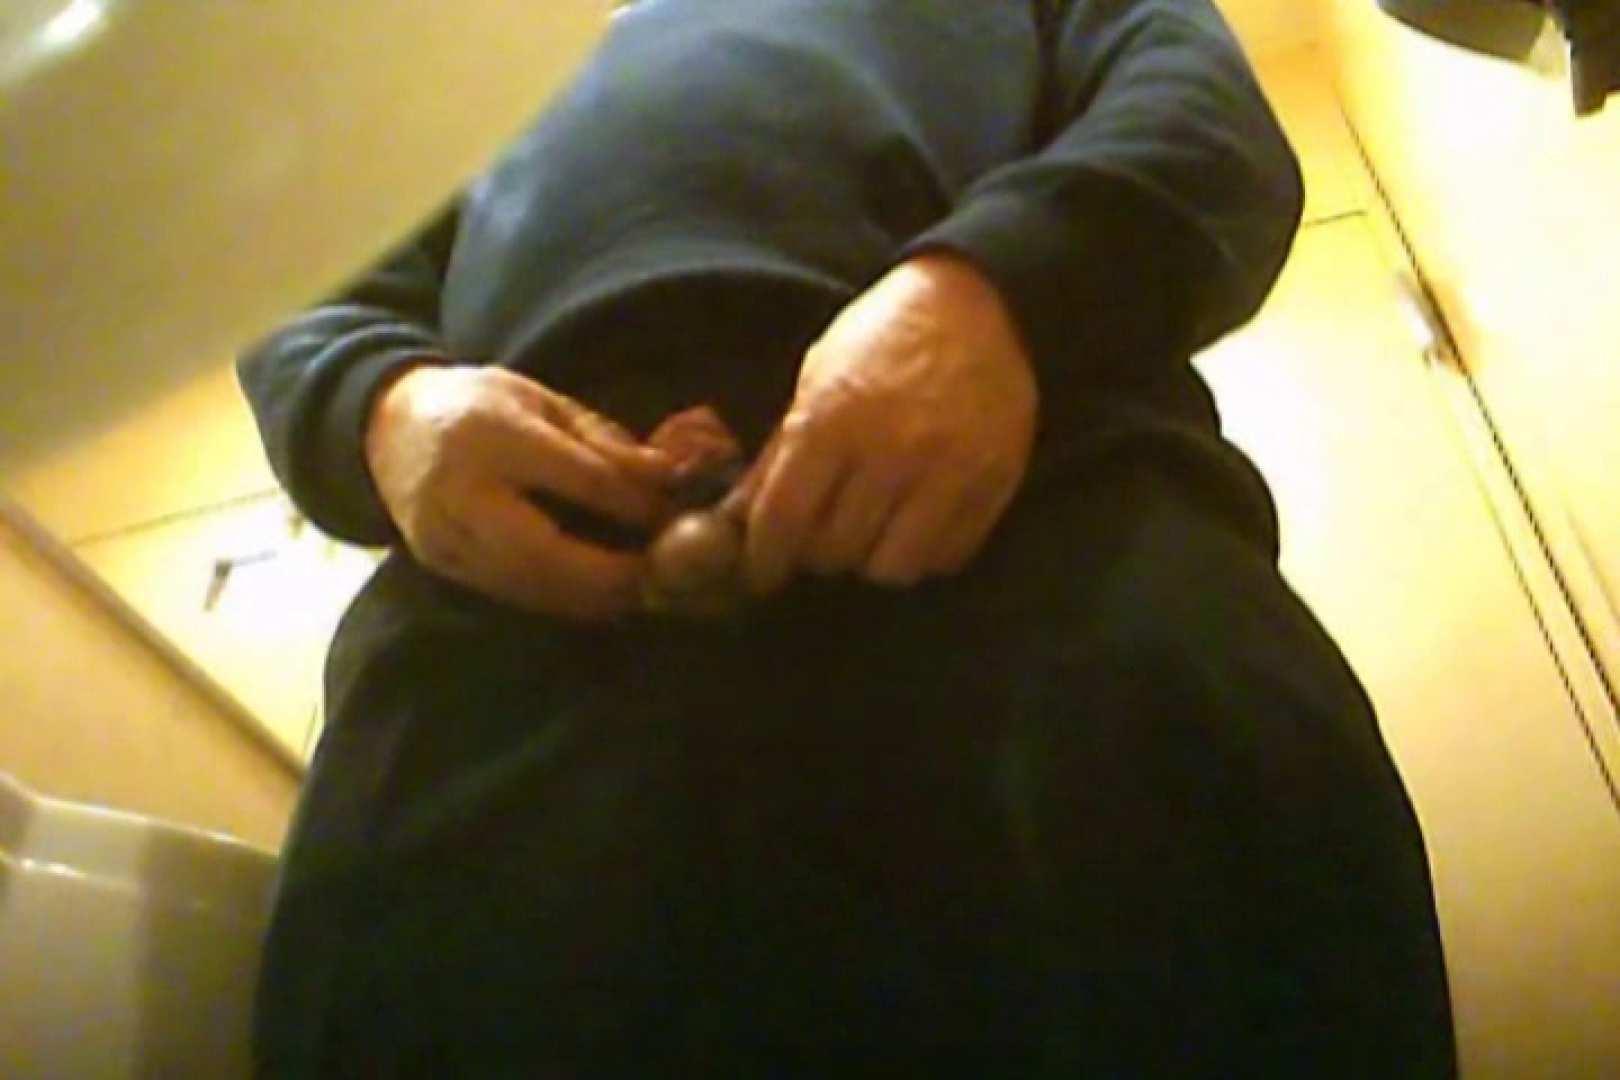 SEASON 3rd!掴み取りさんの洗面所覗き!in新幹線!VOL.03 リーマン系な男たち  71連発 16